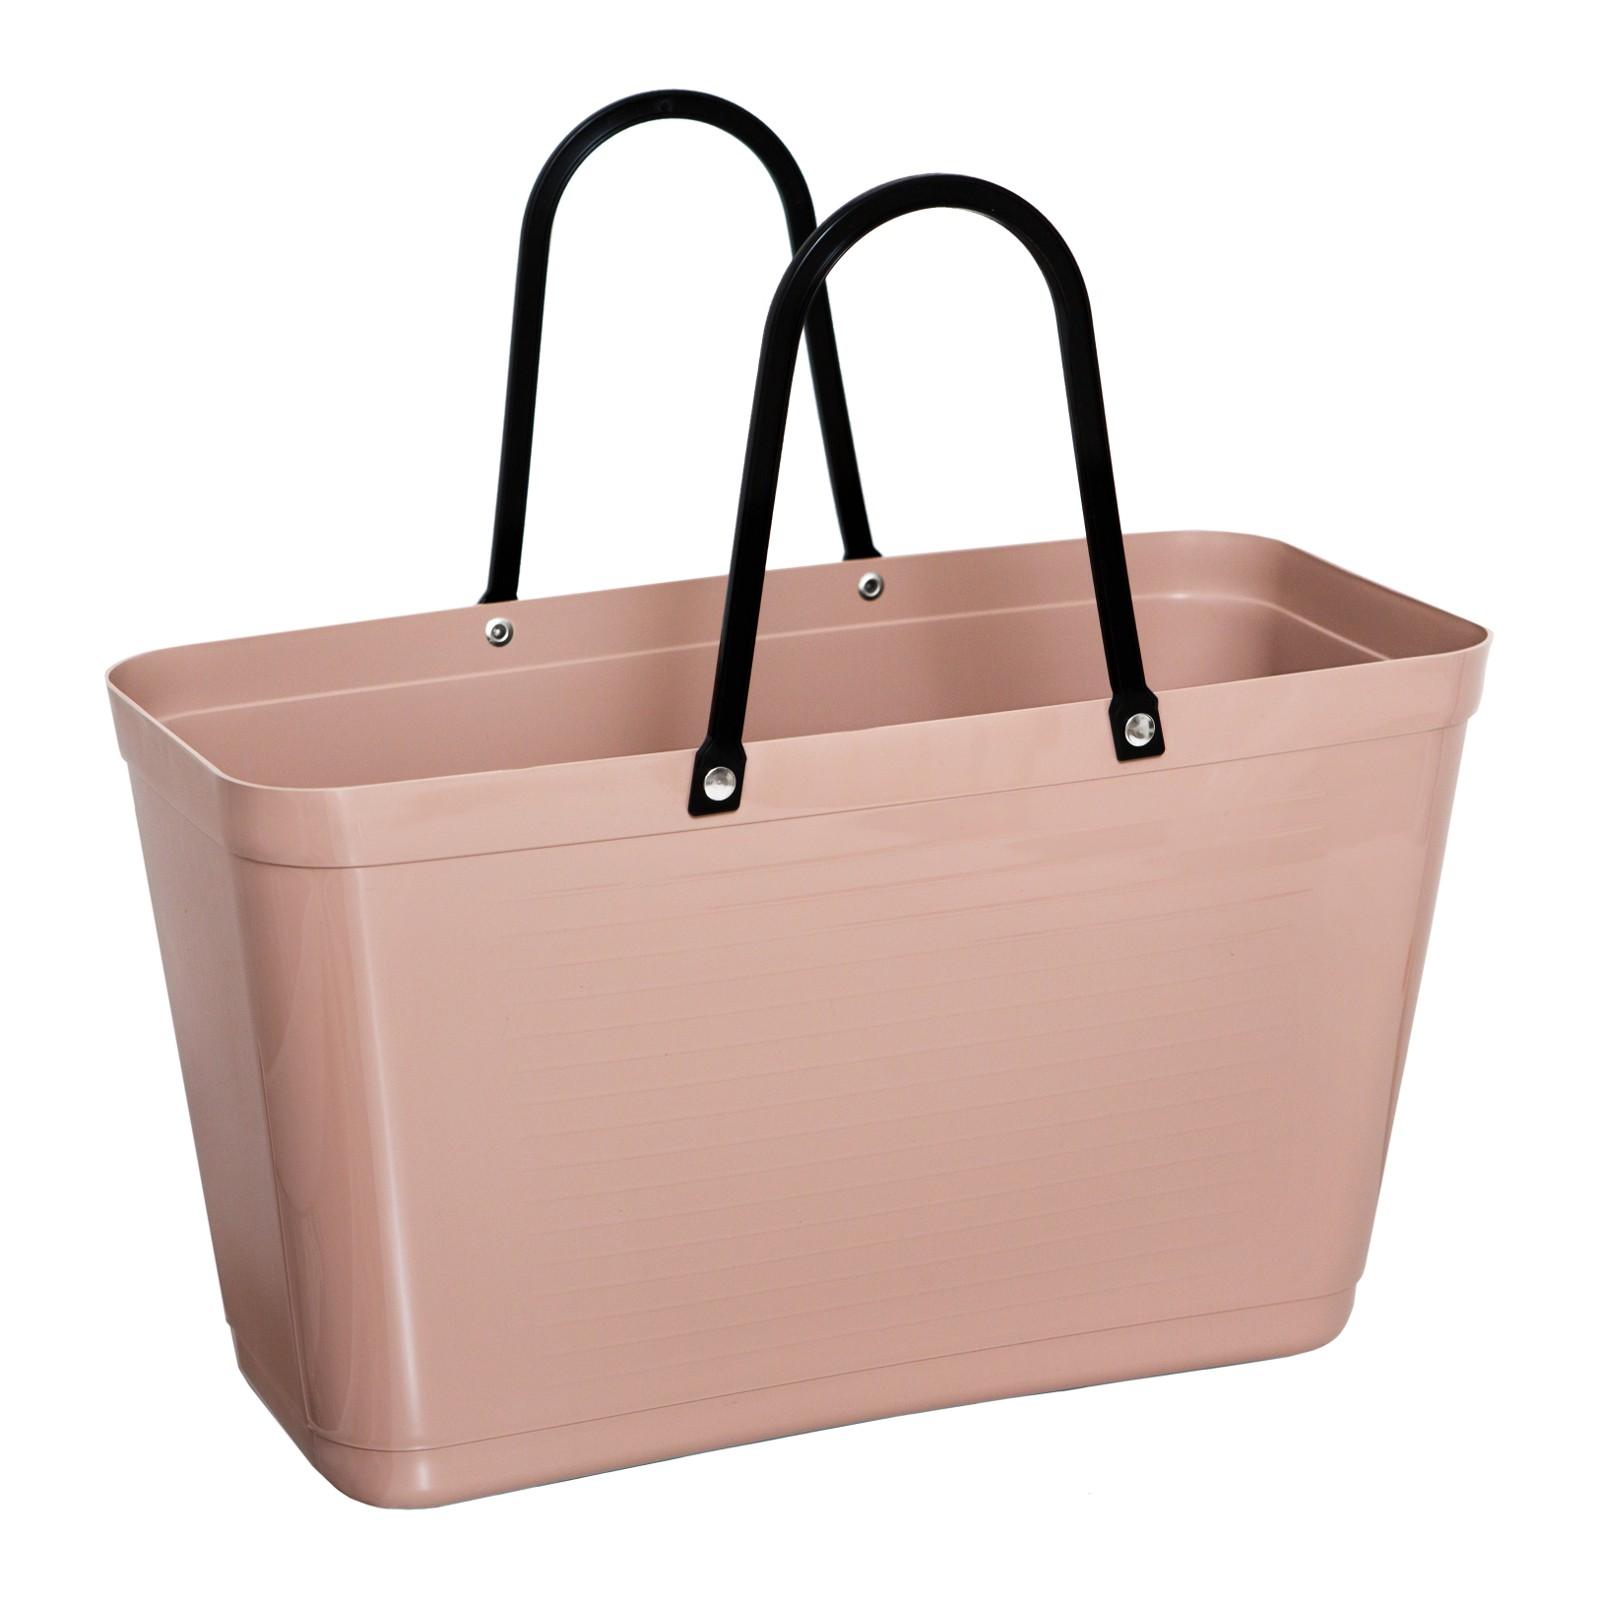 hinza 058-hinza-bag-large-nougat-green-plastic